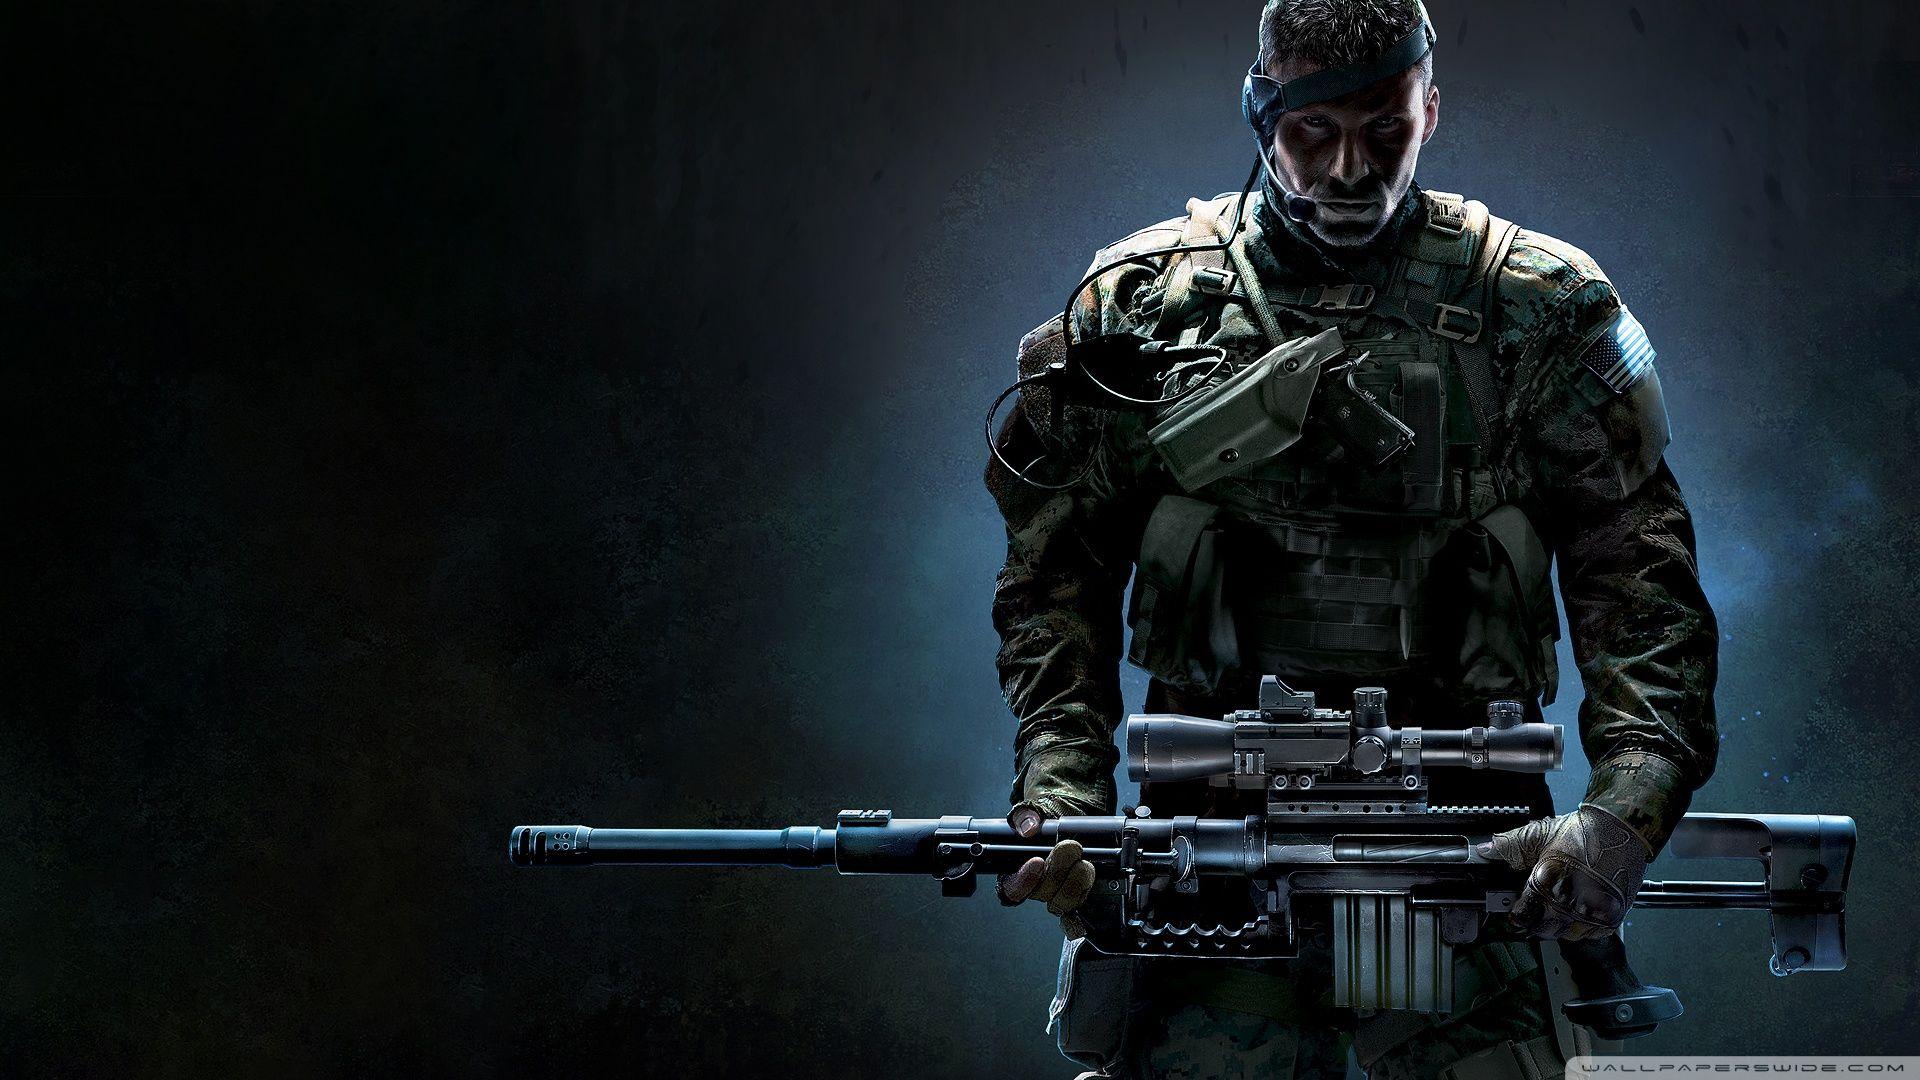 Download Sniper Wallpaper Hd Backgrounds Download Itl Cat